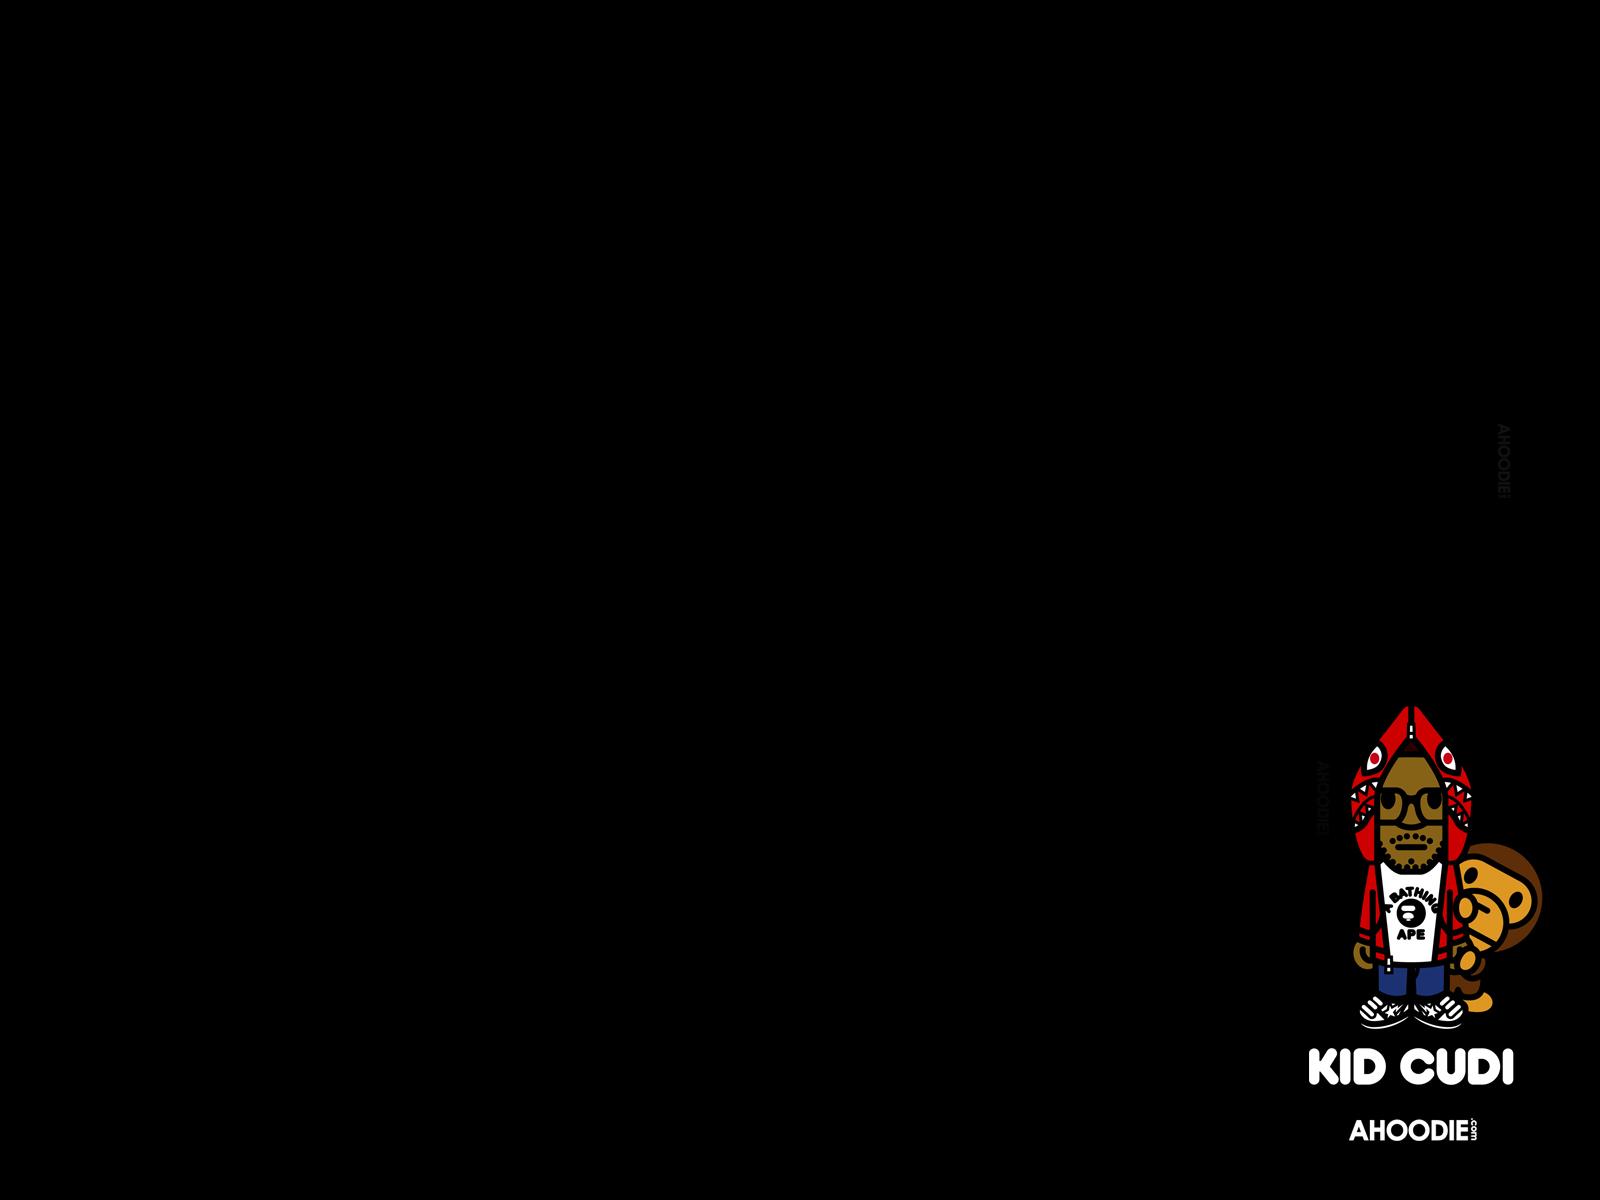 kid cudi bape baby milo wallpaper desktop background logo quality2 1600x1200